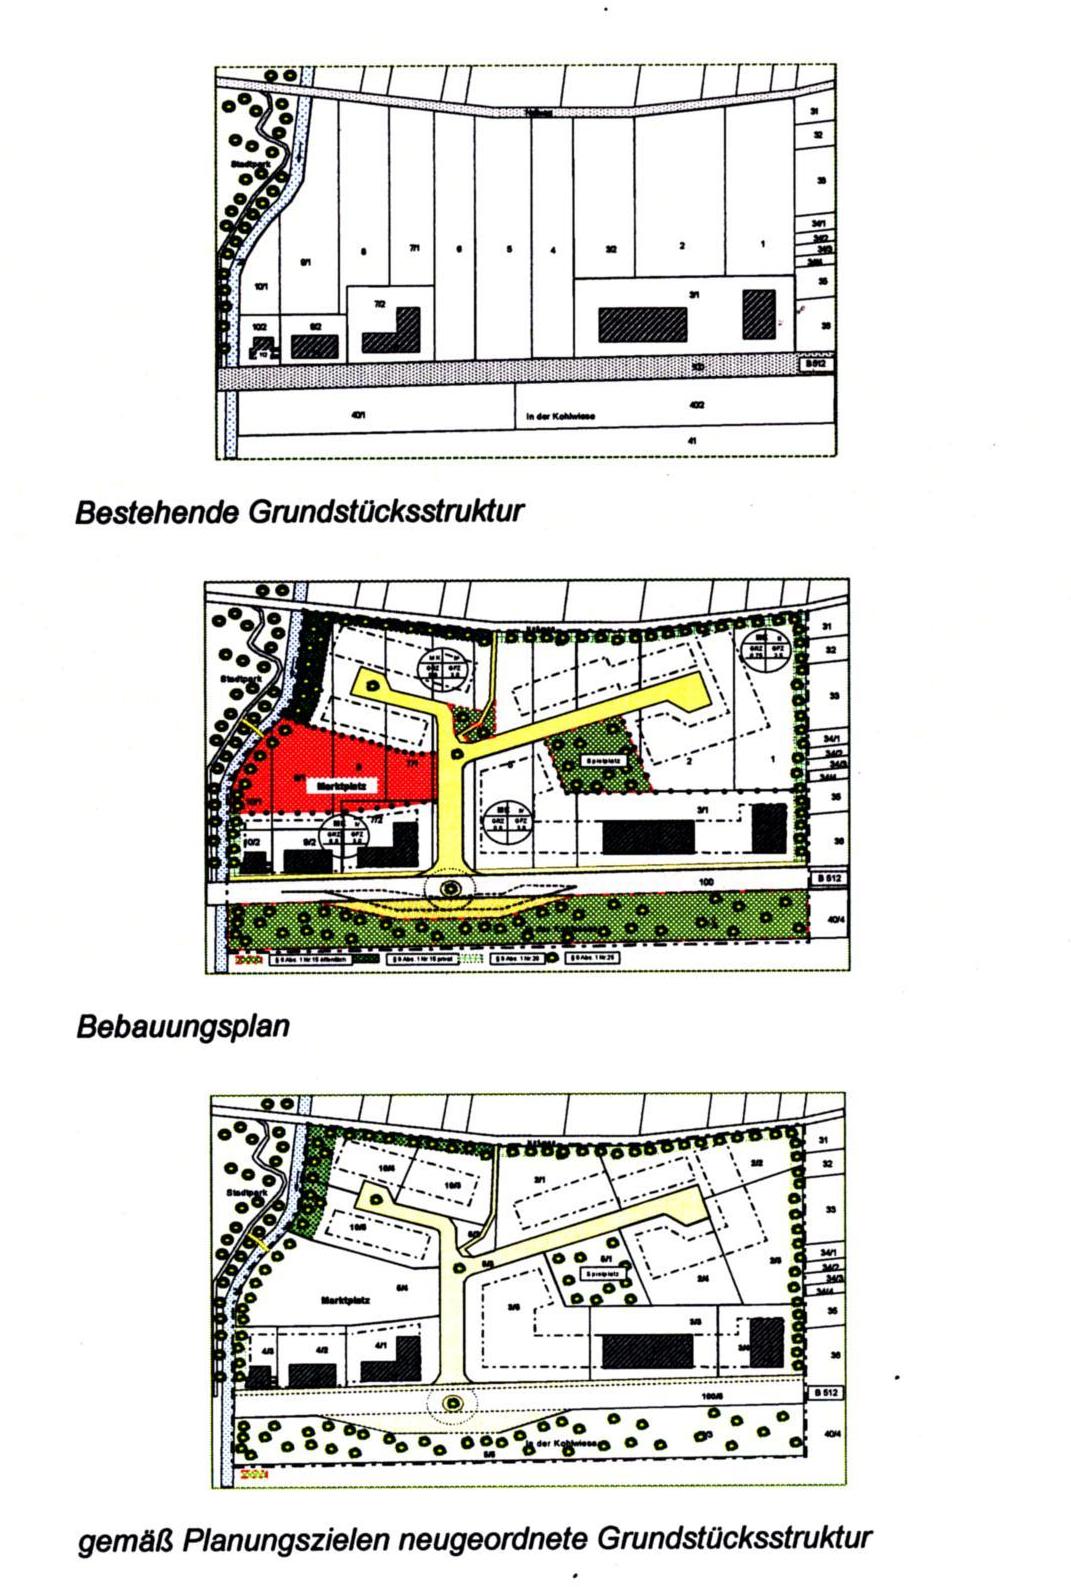 Bild Bodenmanagment 1Bild Bodenmanagment 1